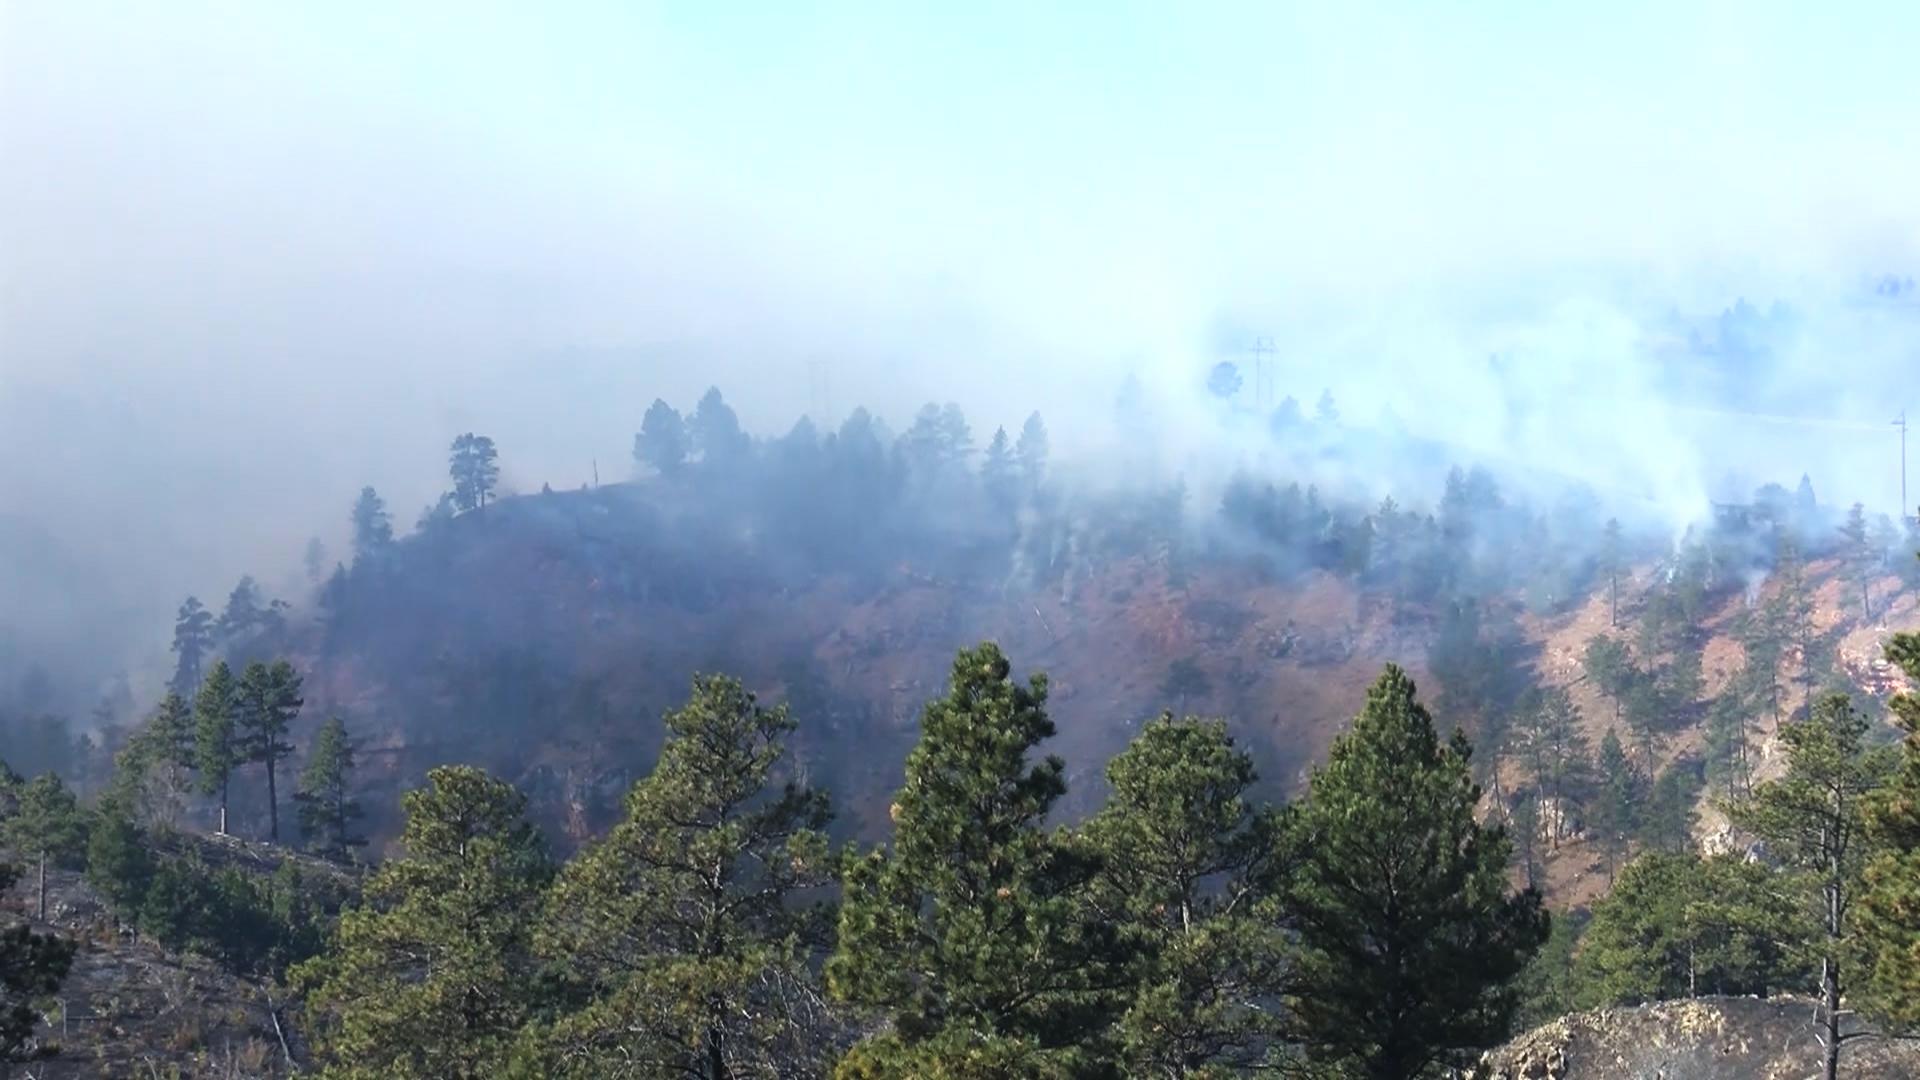 Smoke from Schroeder fire over Black Hills